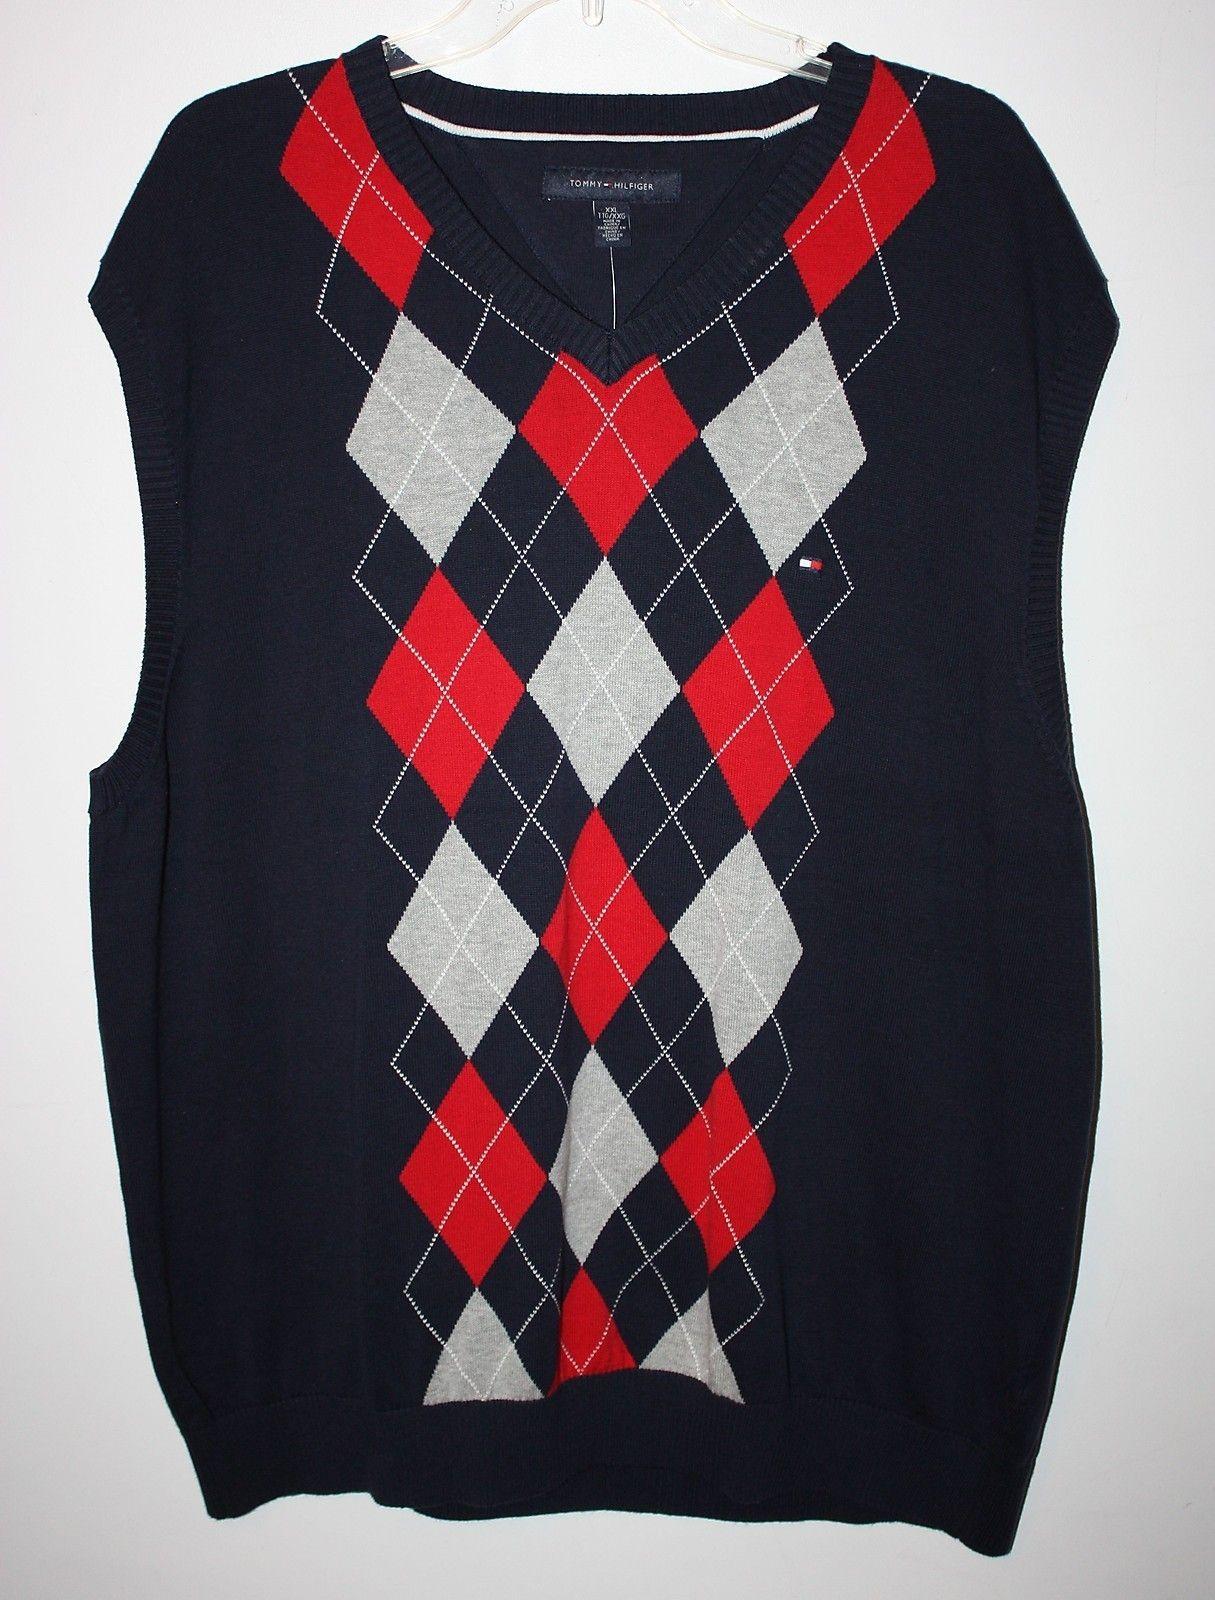 Mens Size 2X Tommy Hilfiger Argyle Sweater Vest Navy Blue,Pink & Gray NEW NWT | eBay